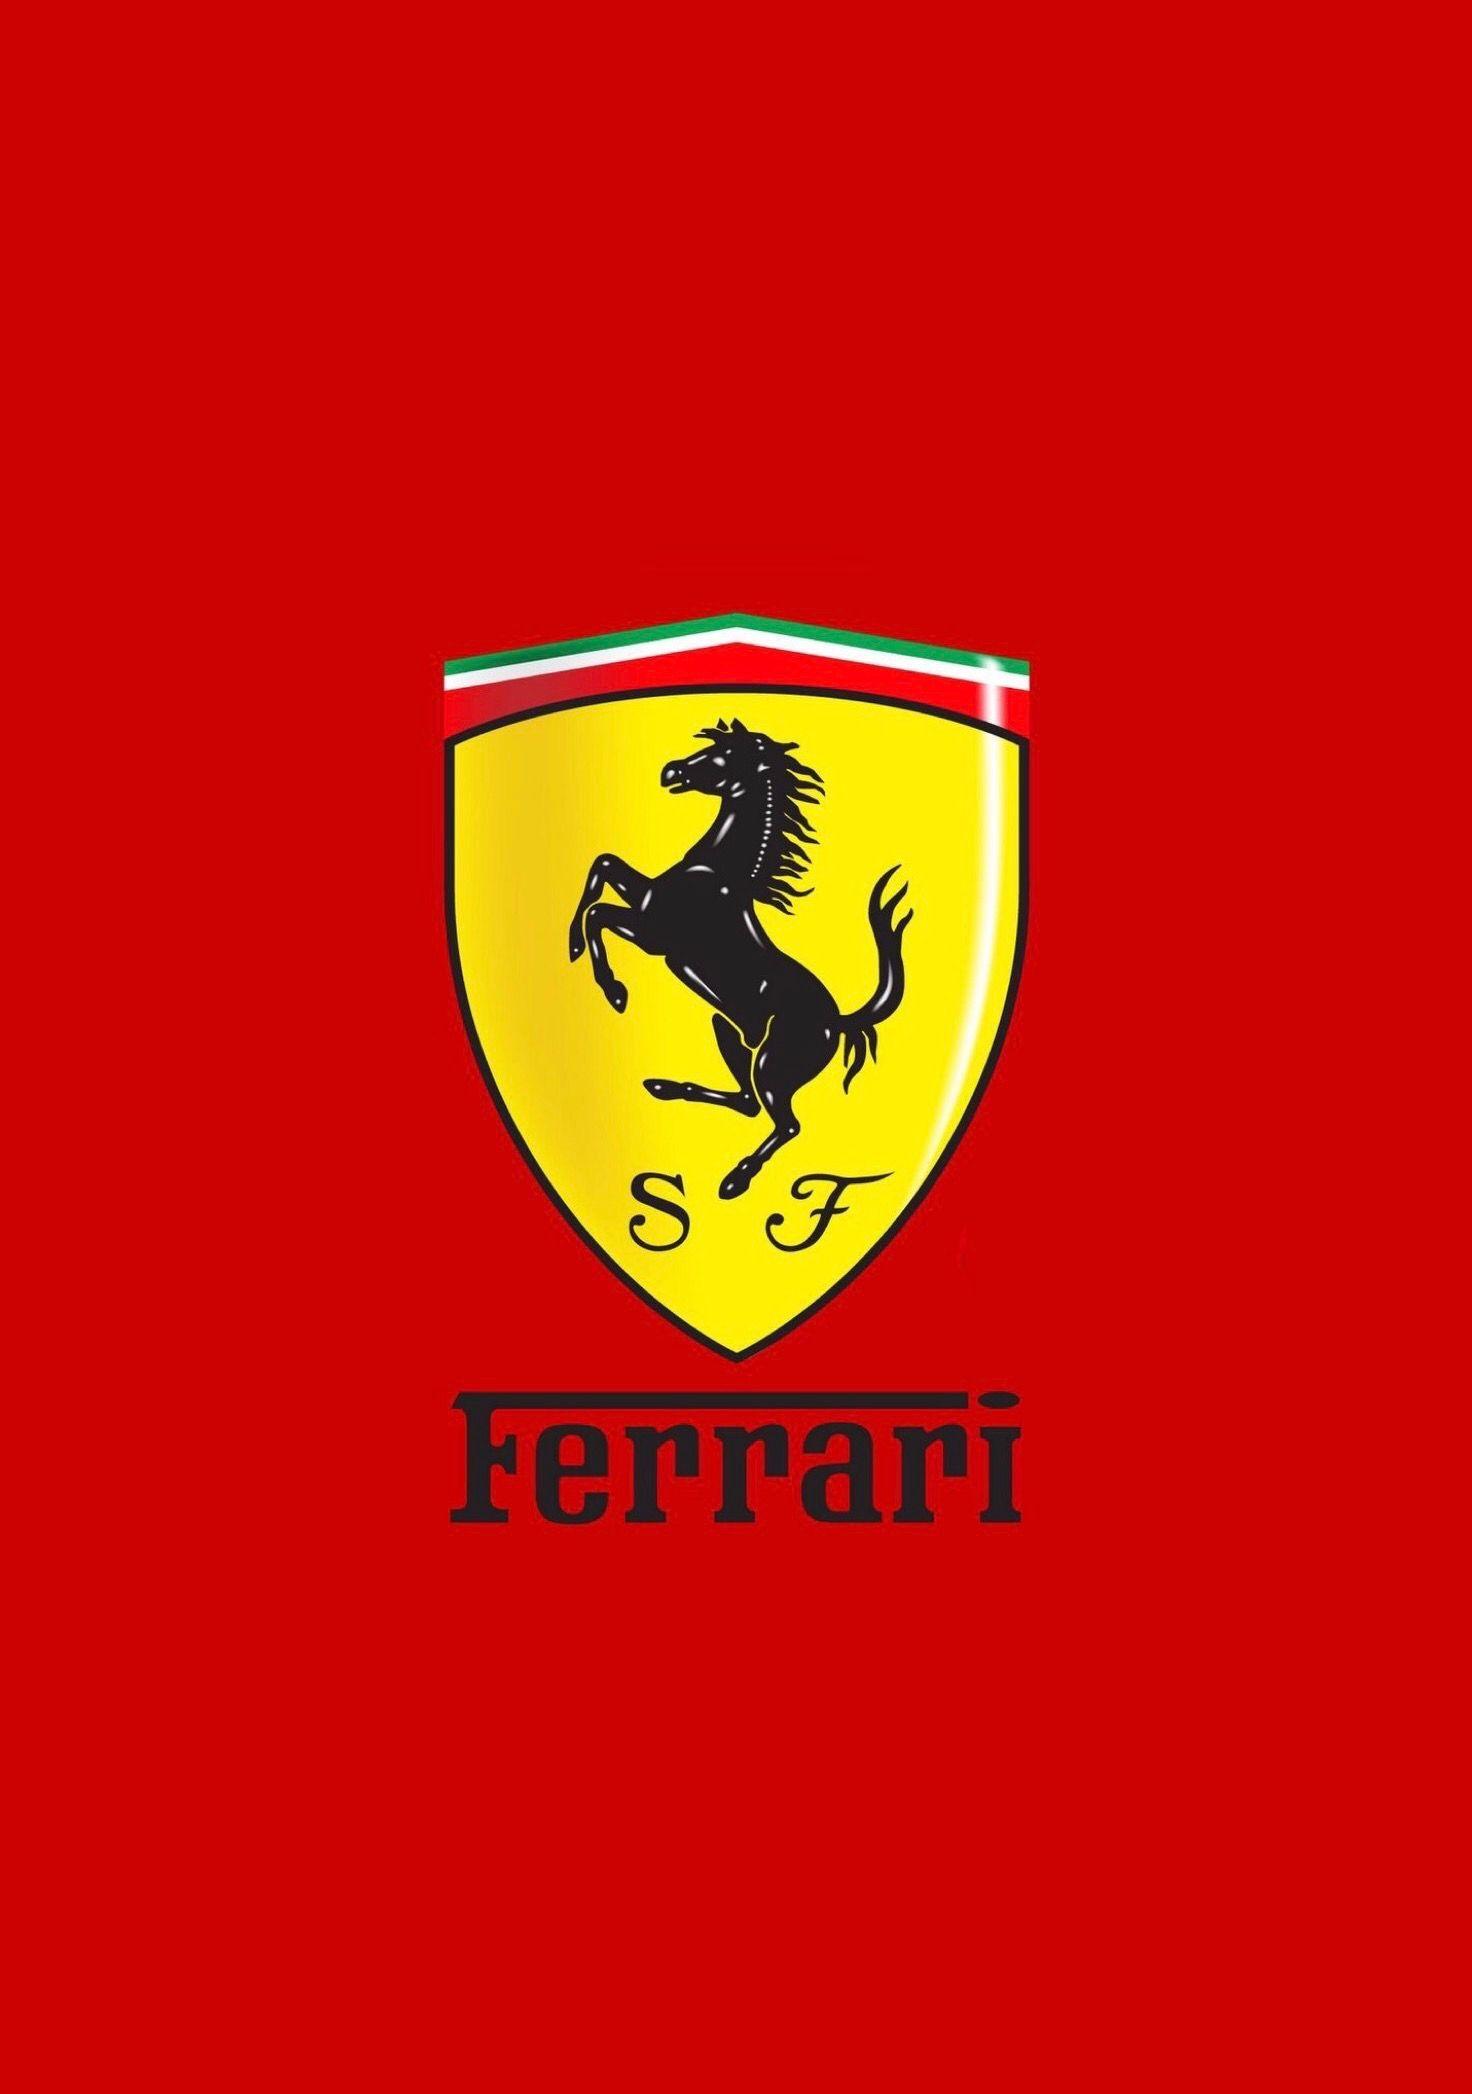 wallpapers ferrari logo - photo #15